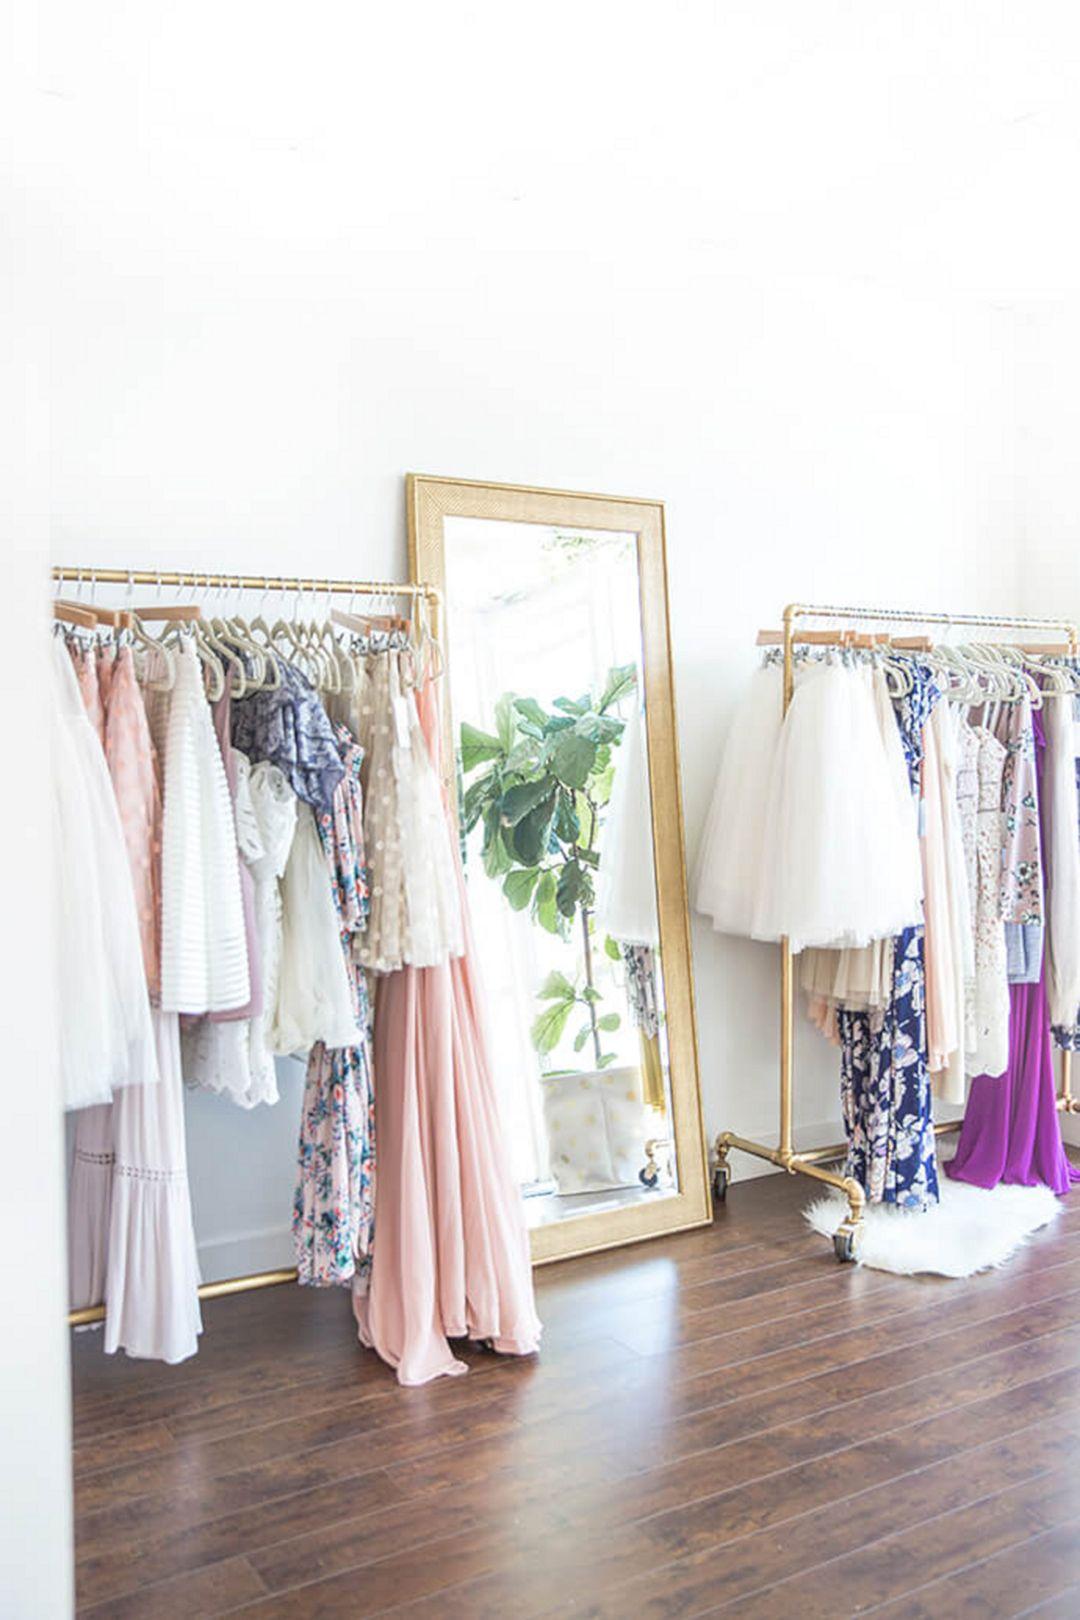 Clothing Boutique Interior Design Ideas 10 (Clothing Boutique ...